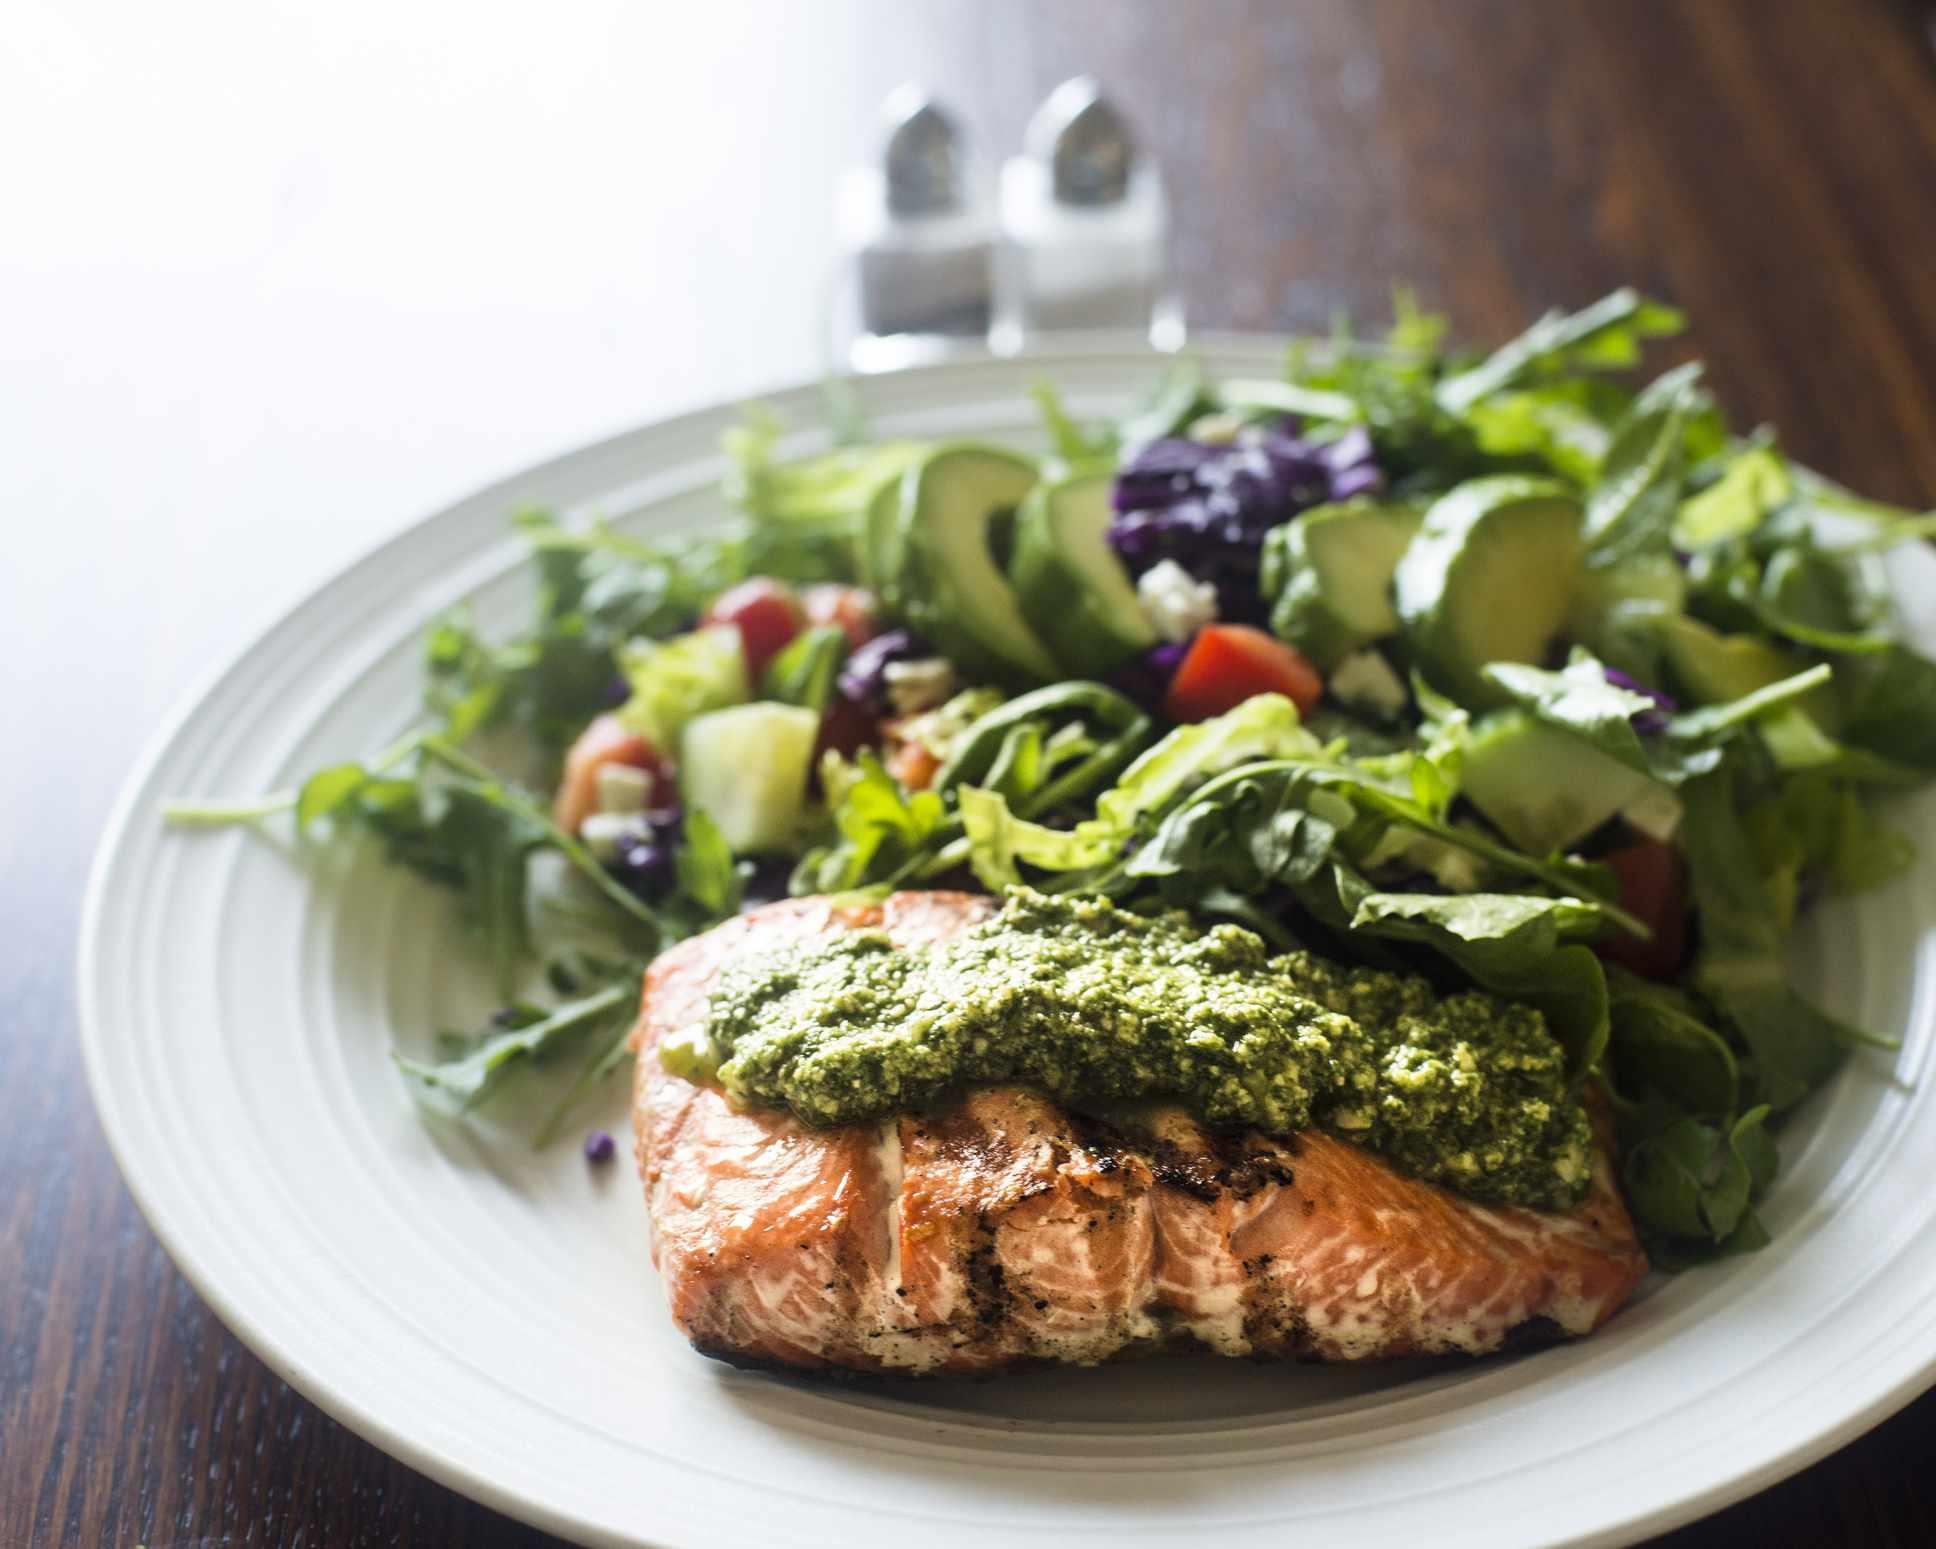 Filete de salmón al pesto y ensalada